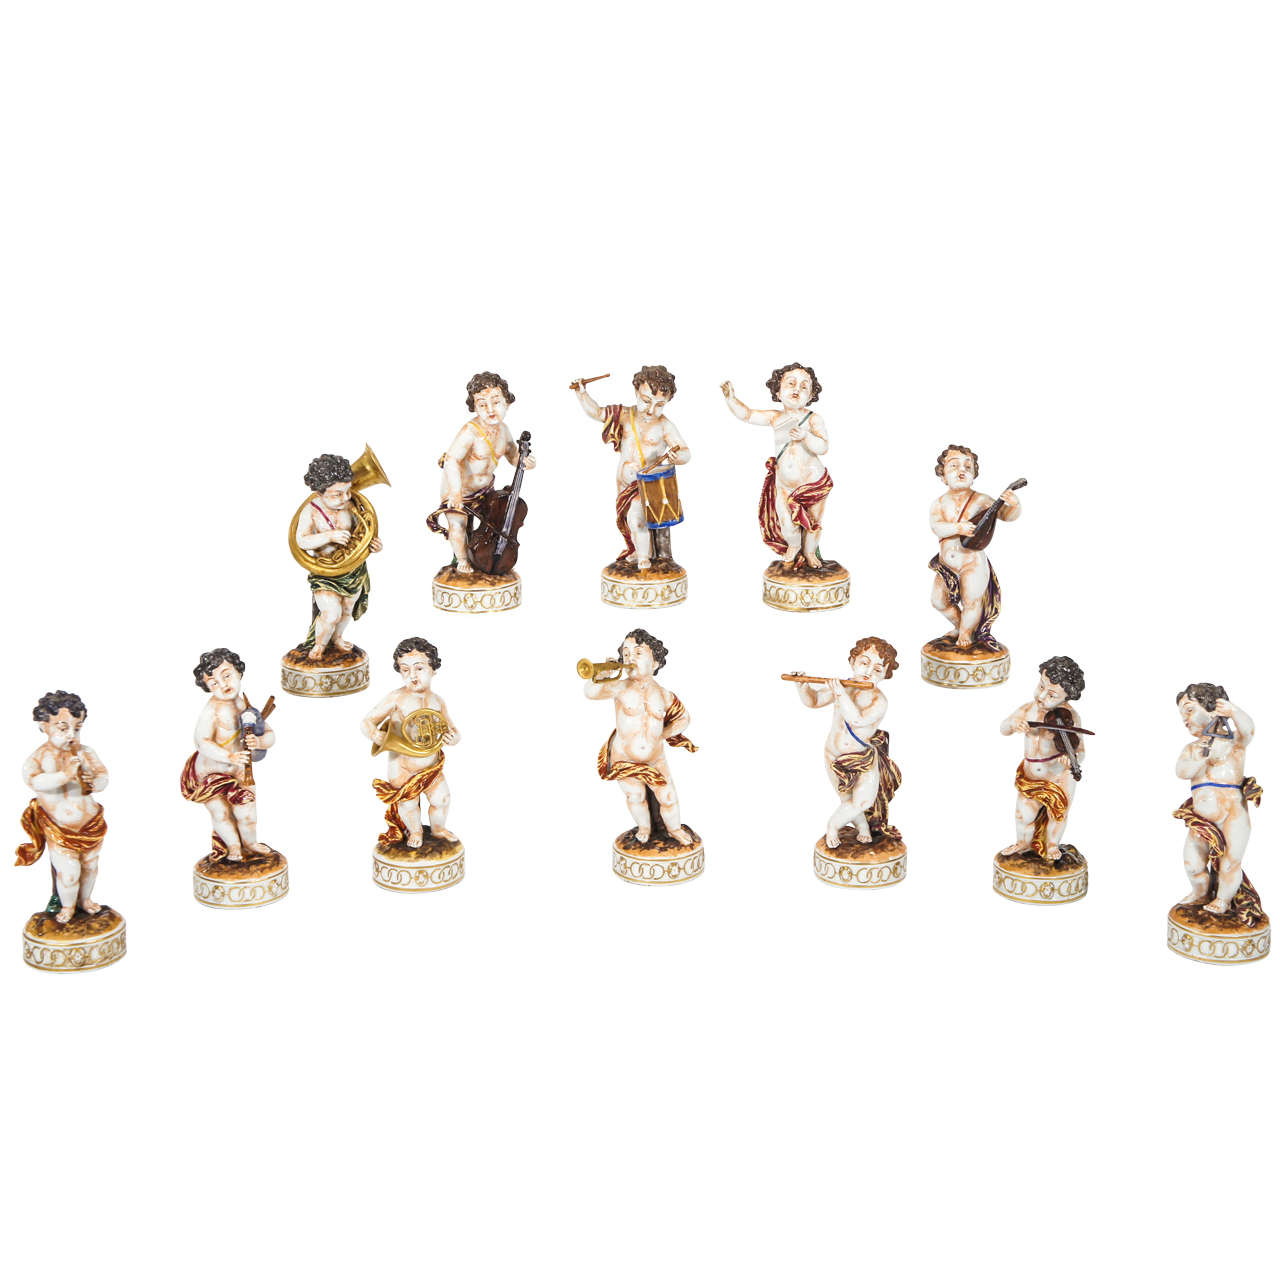 Complete Set of 12 Capo Di Monte Putti Figurines Depicting Musicians